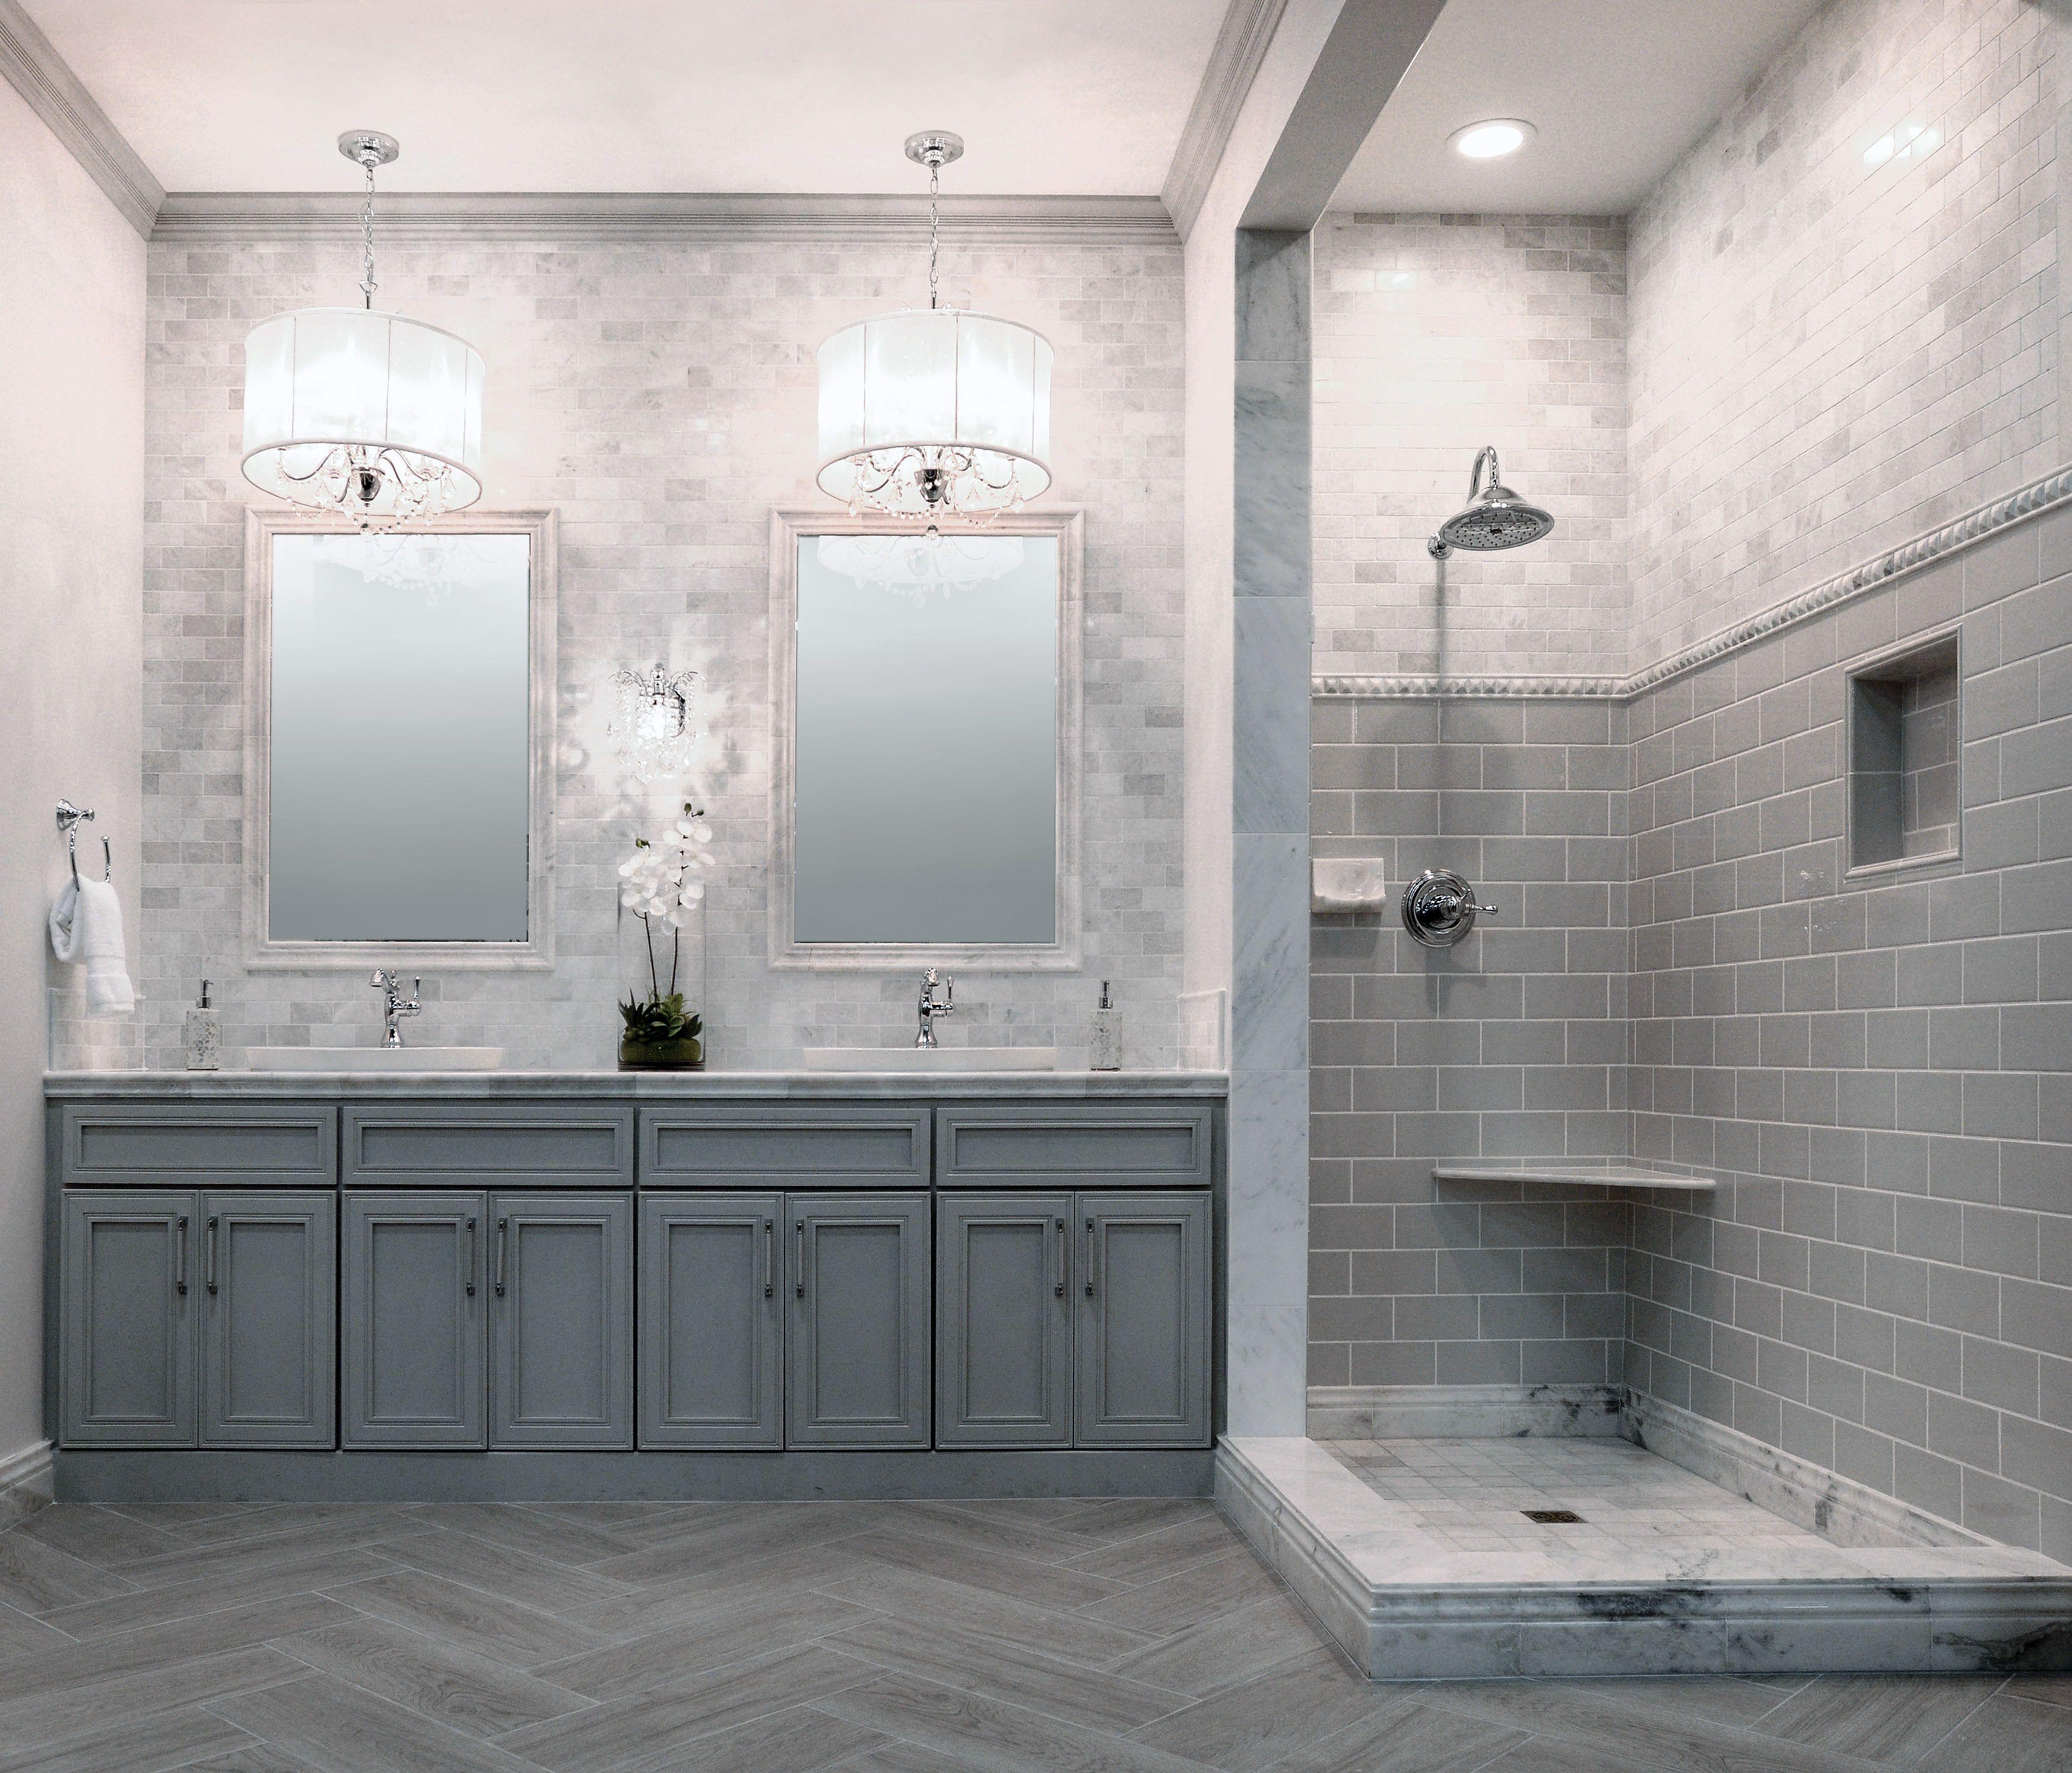 Elegant Bathroom Designs: Luxury Bathroom Design Ideas Displaying Elegant Chandelier